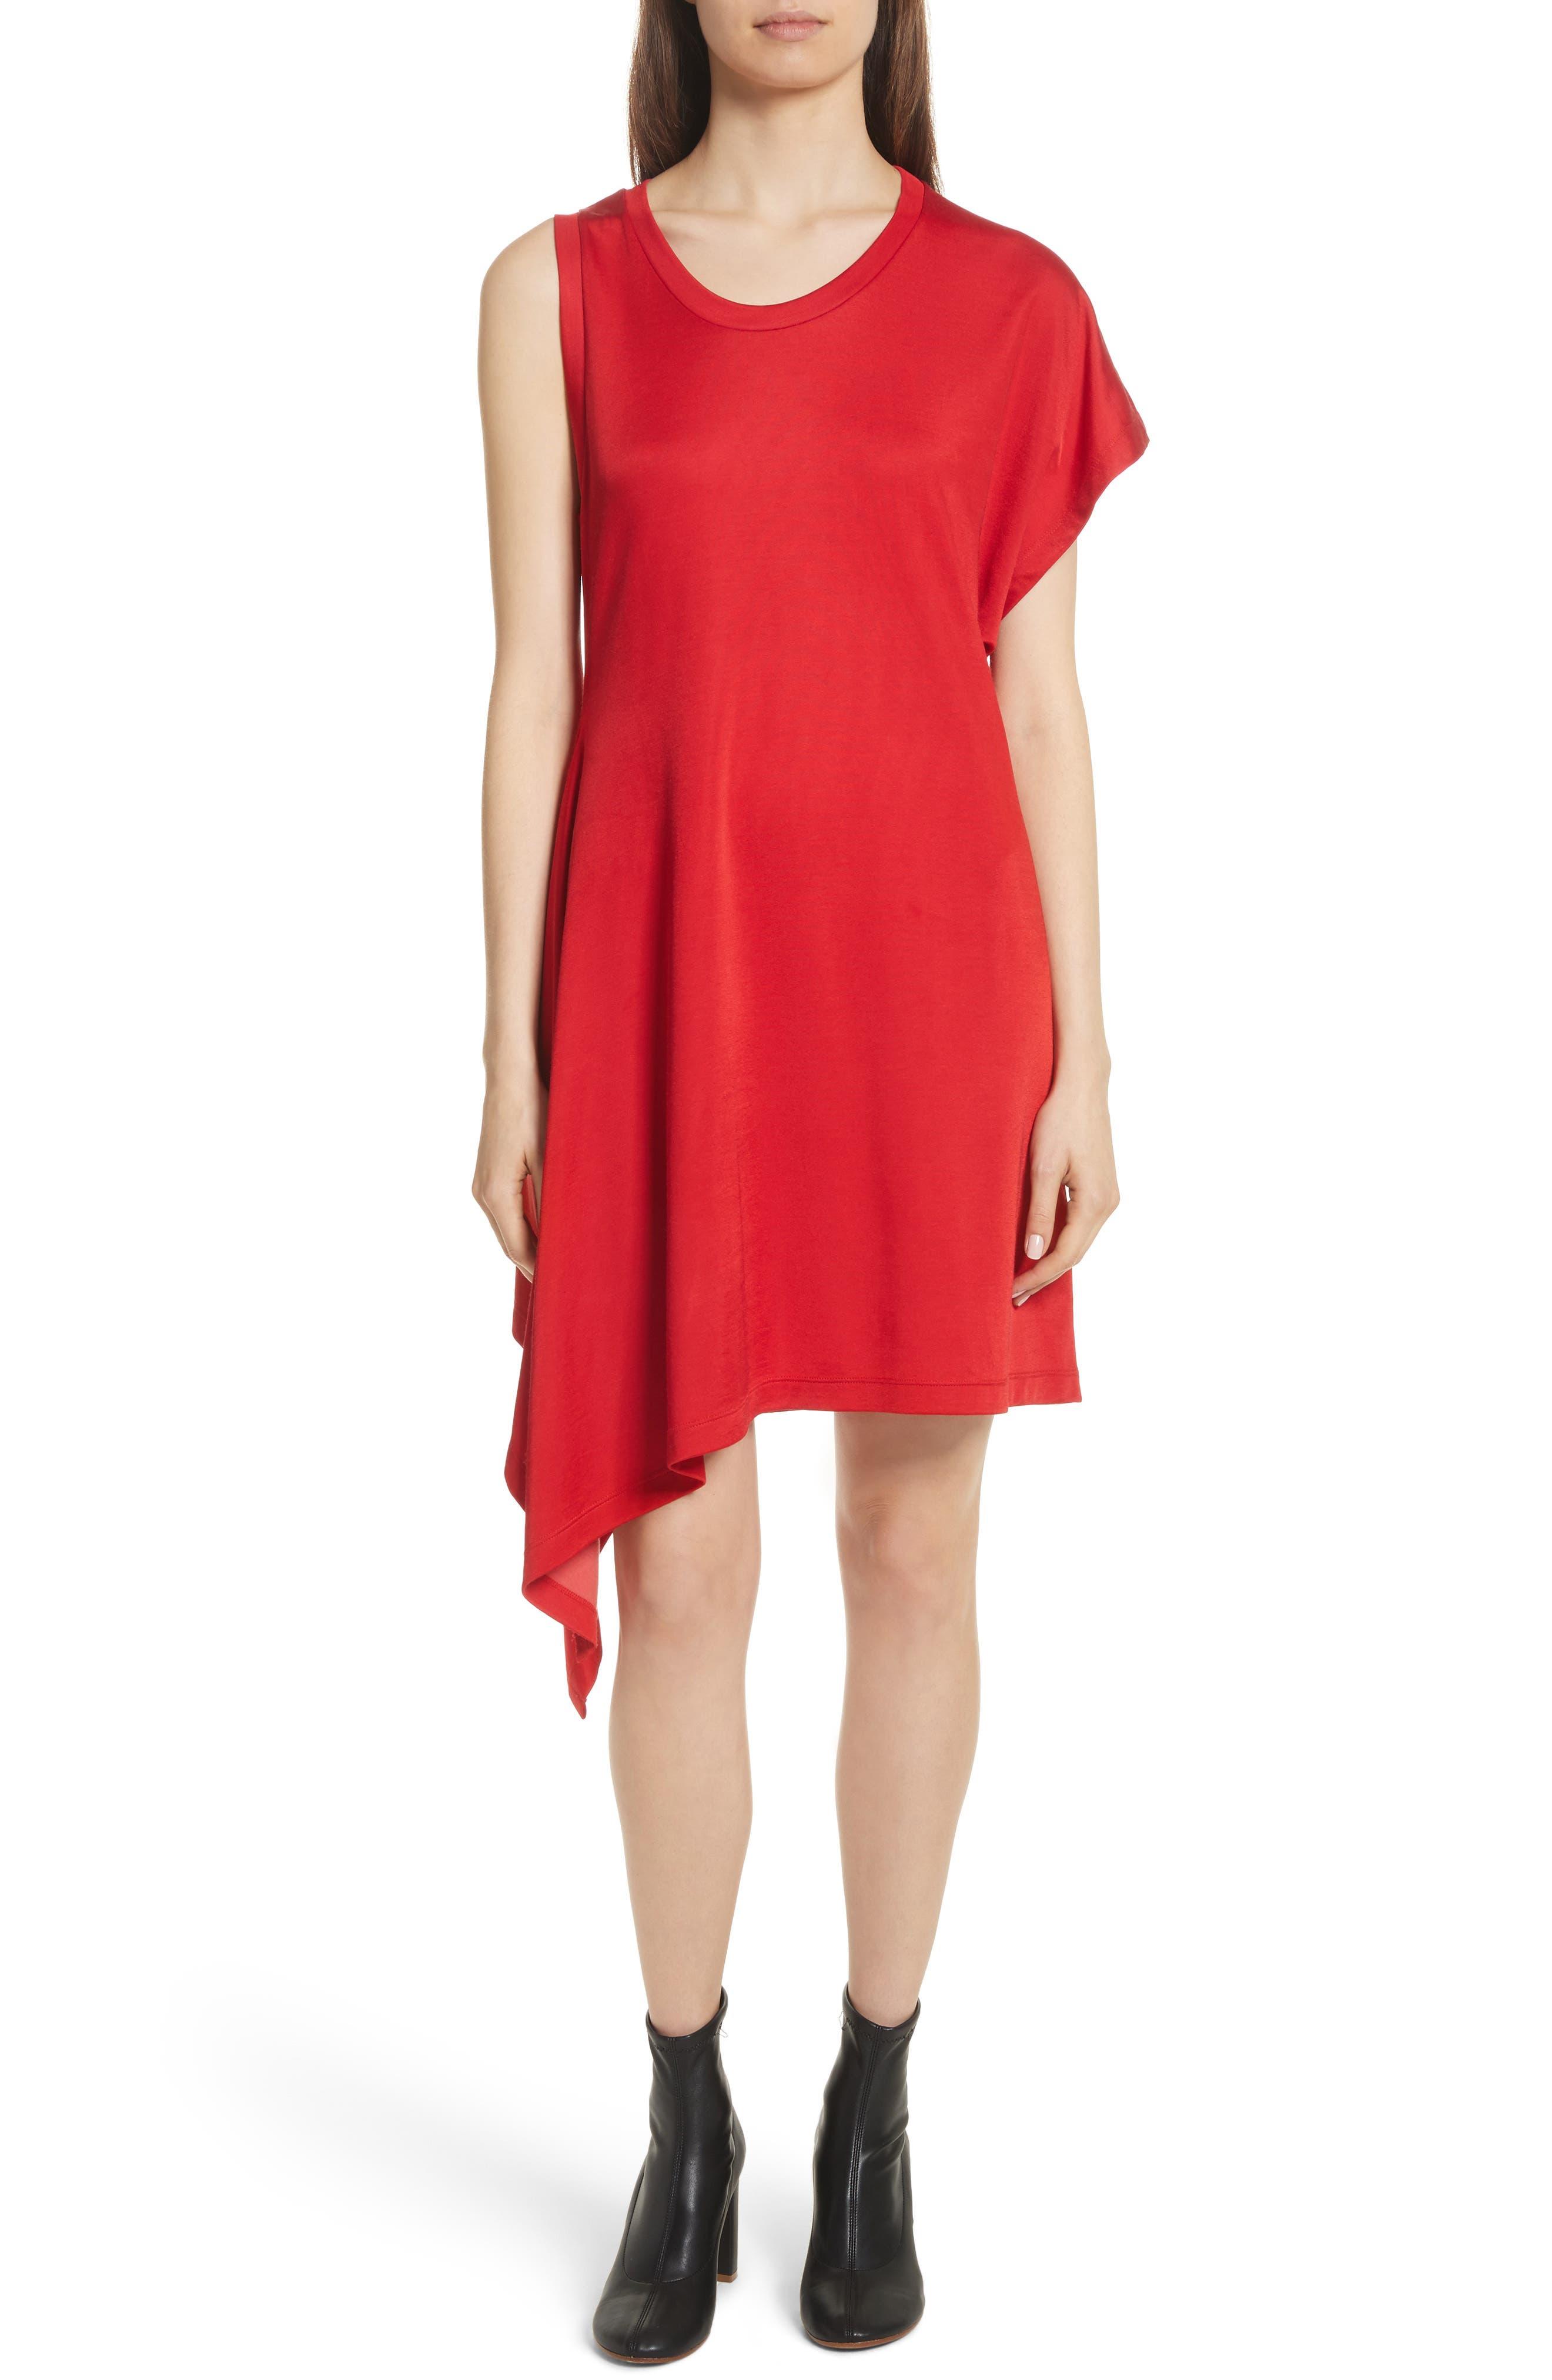 MM6 Maison Margiela Sporty Asymmetrical Jersey Dress